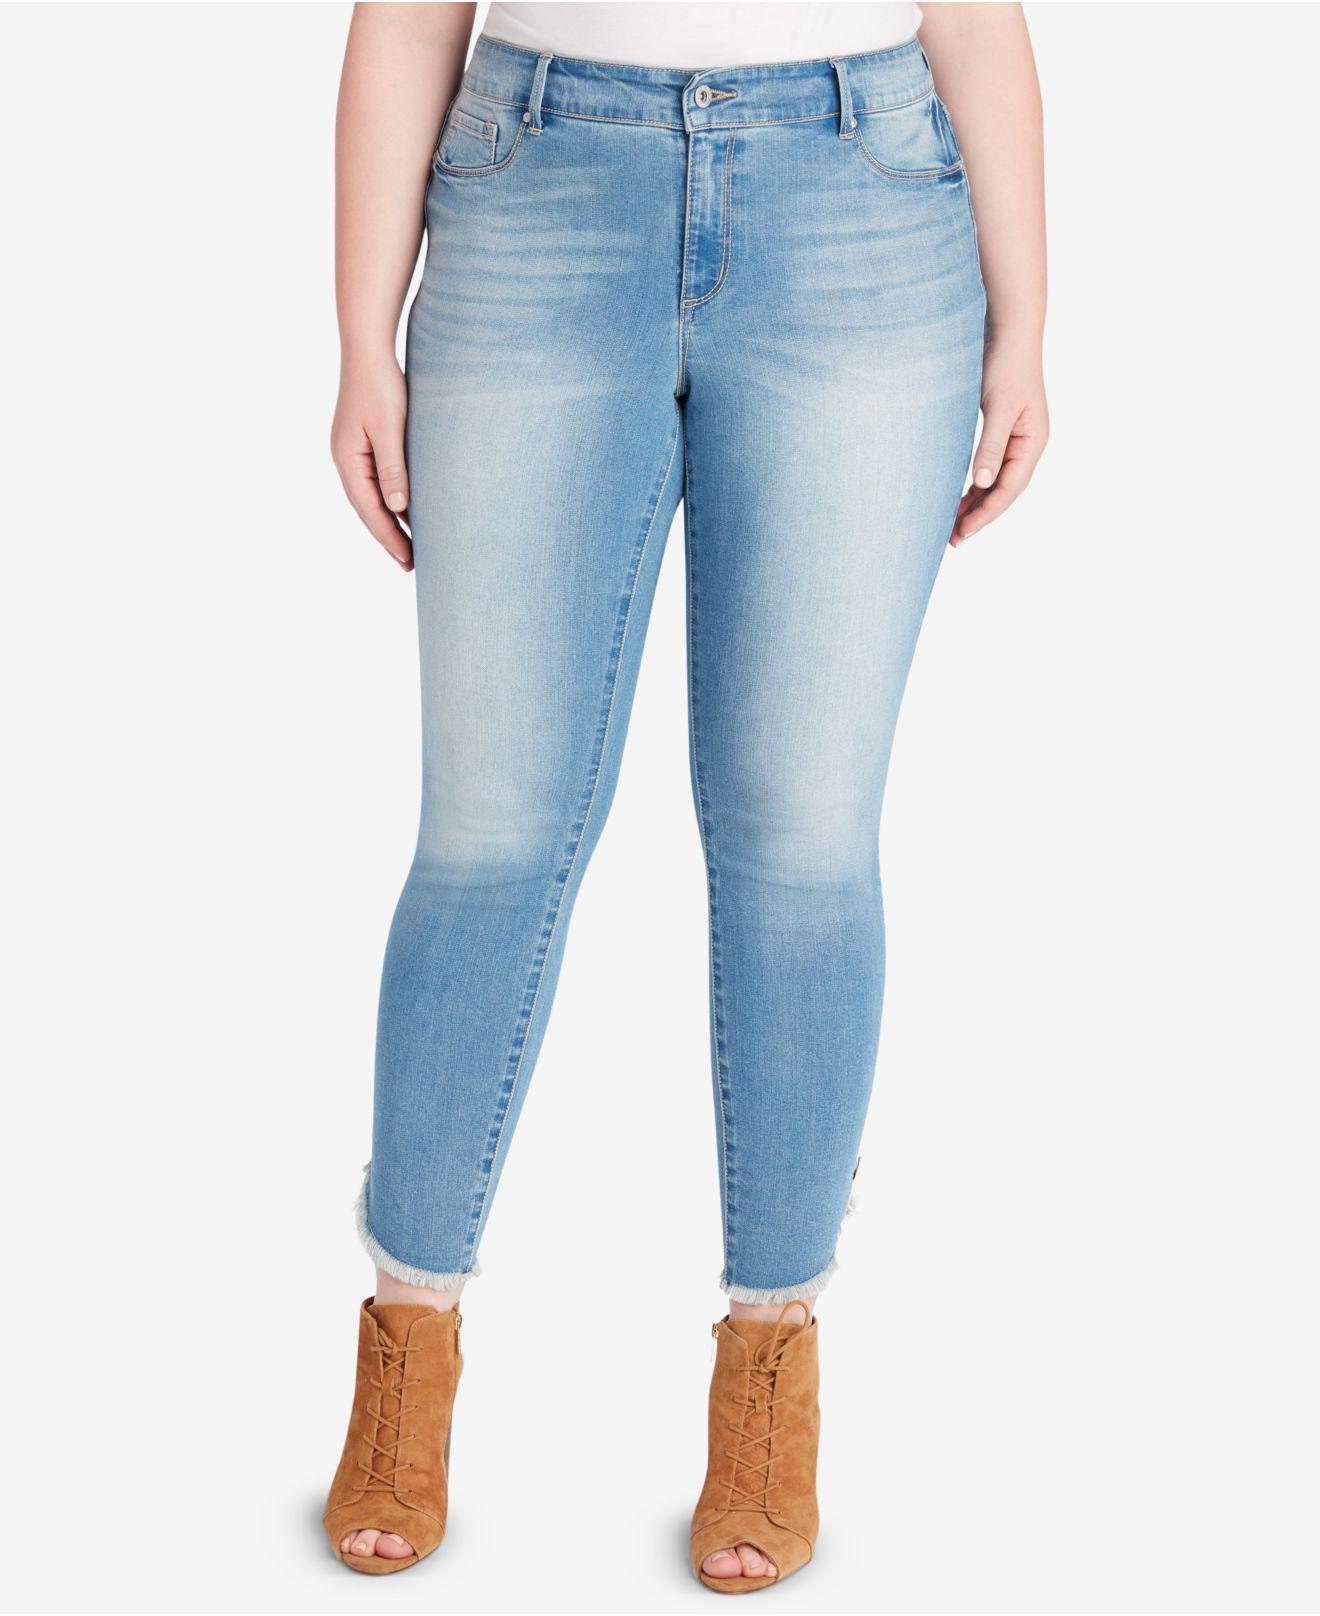 a3c9b1087c0 Jessica Simpson. Women s Blue Trendy Plus Size Kiss Me Super Skinny Jeans